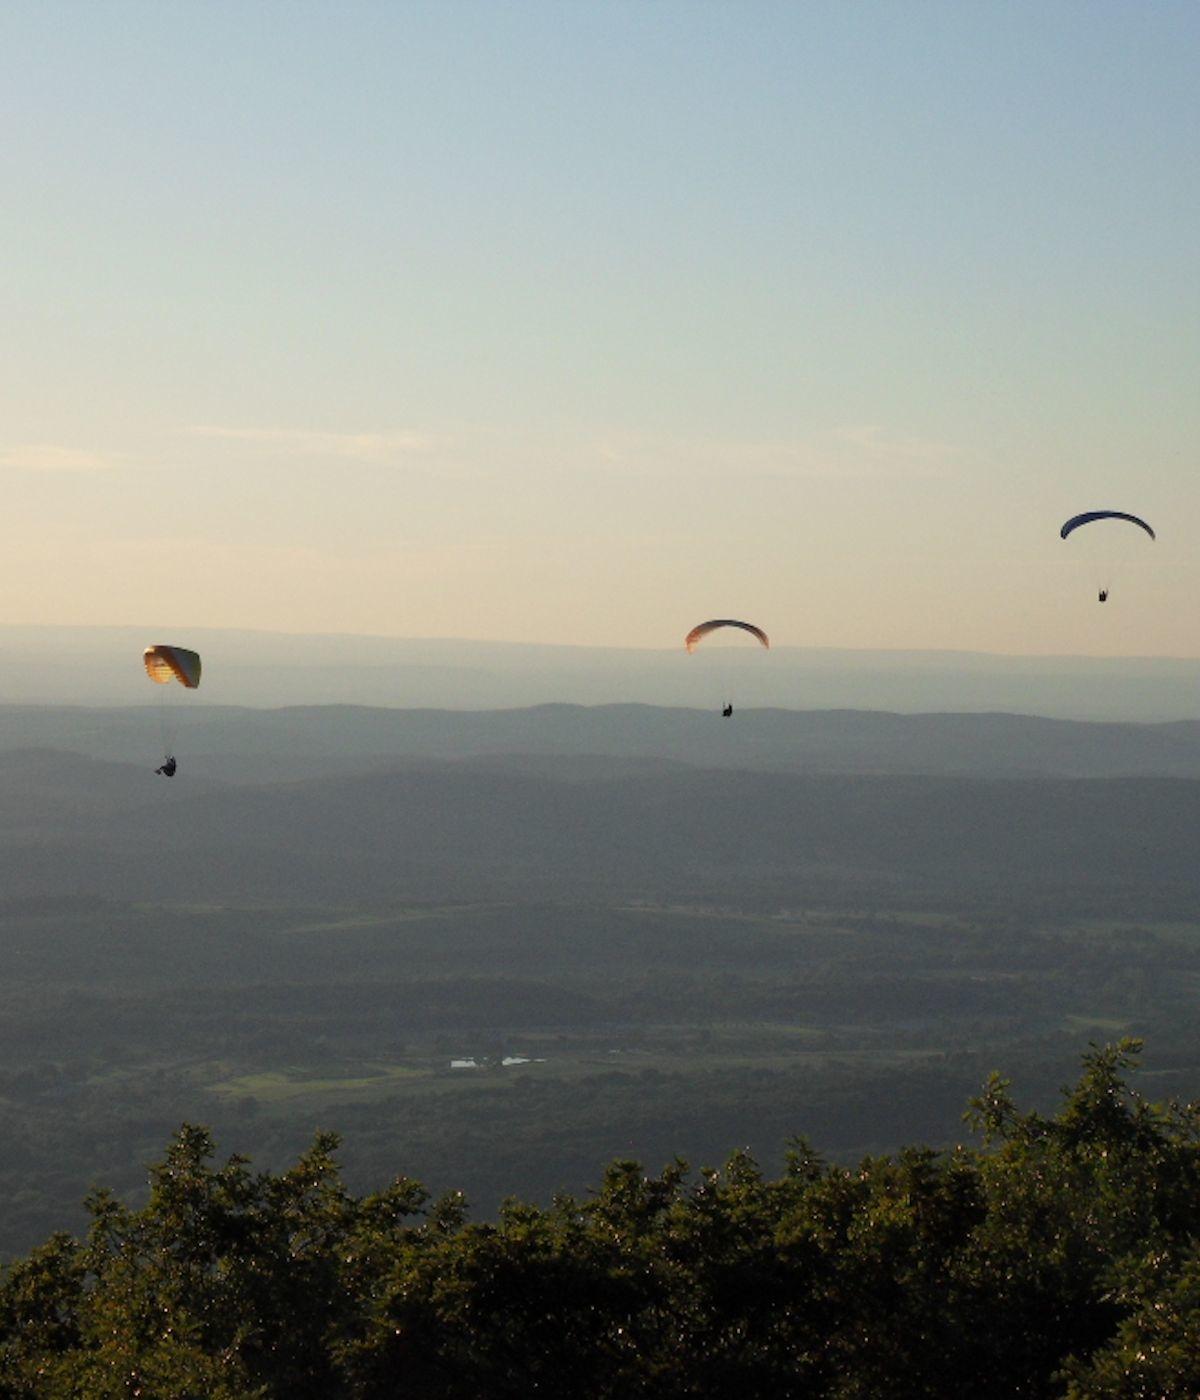 Let's Go Paragliding.Llc